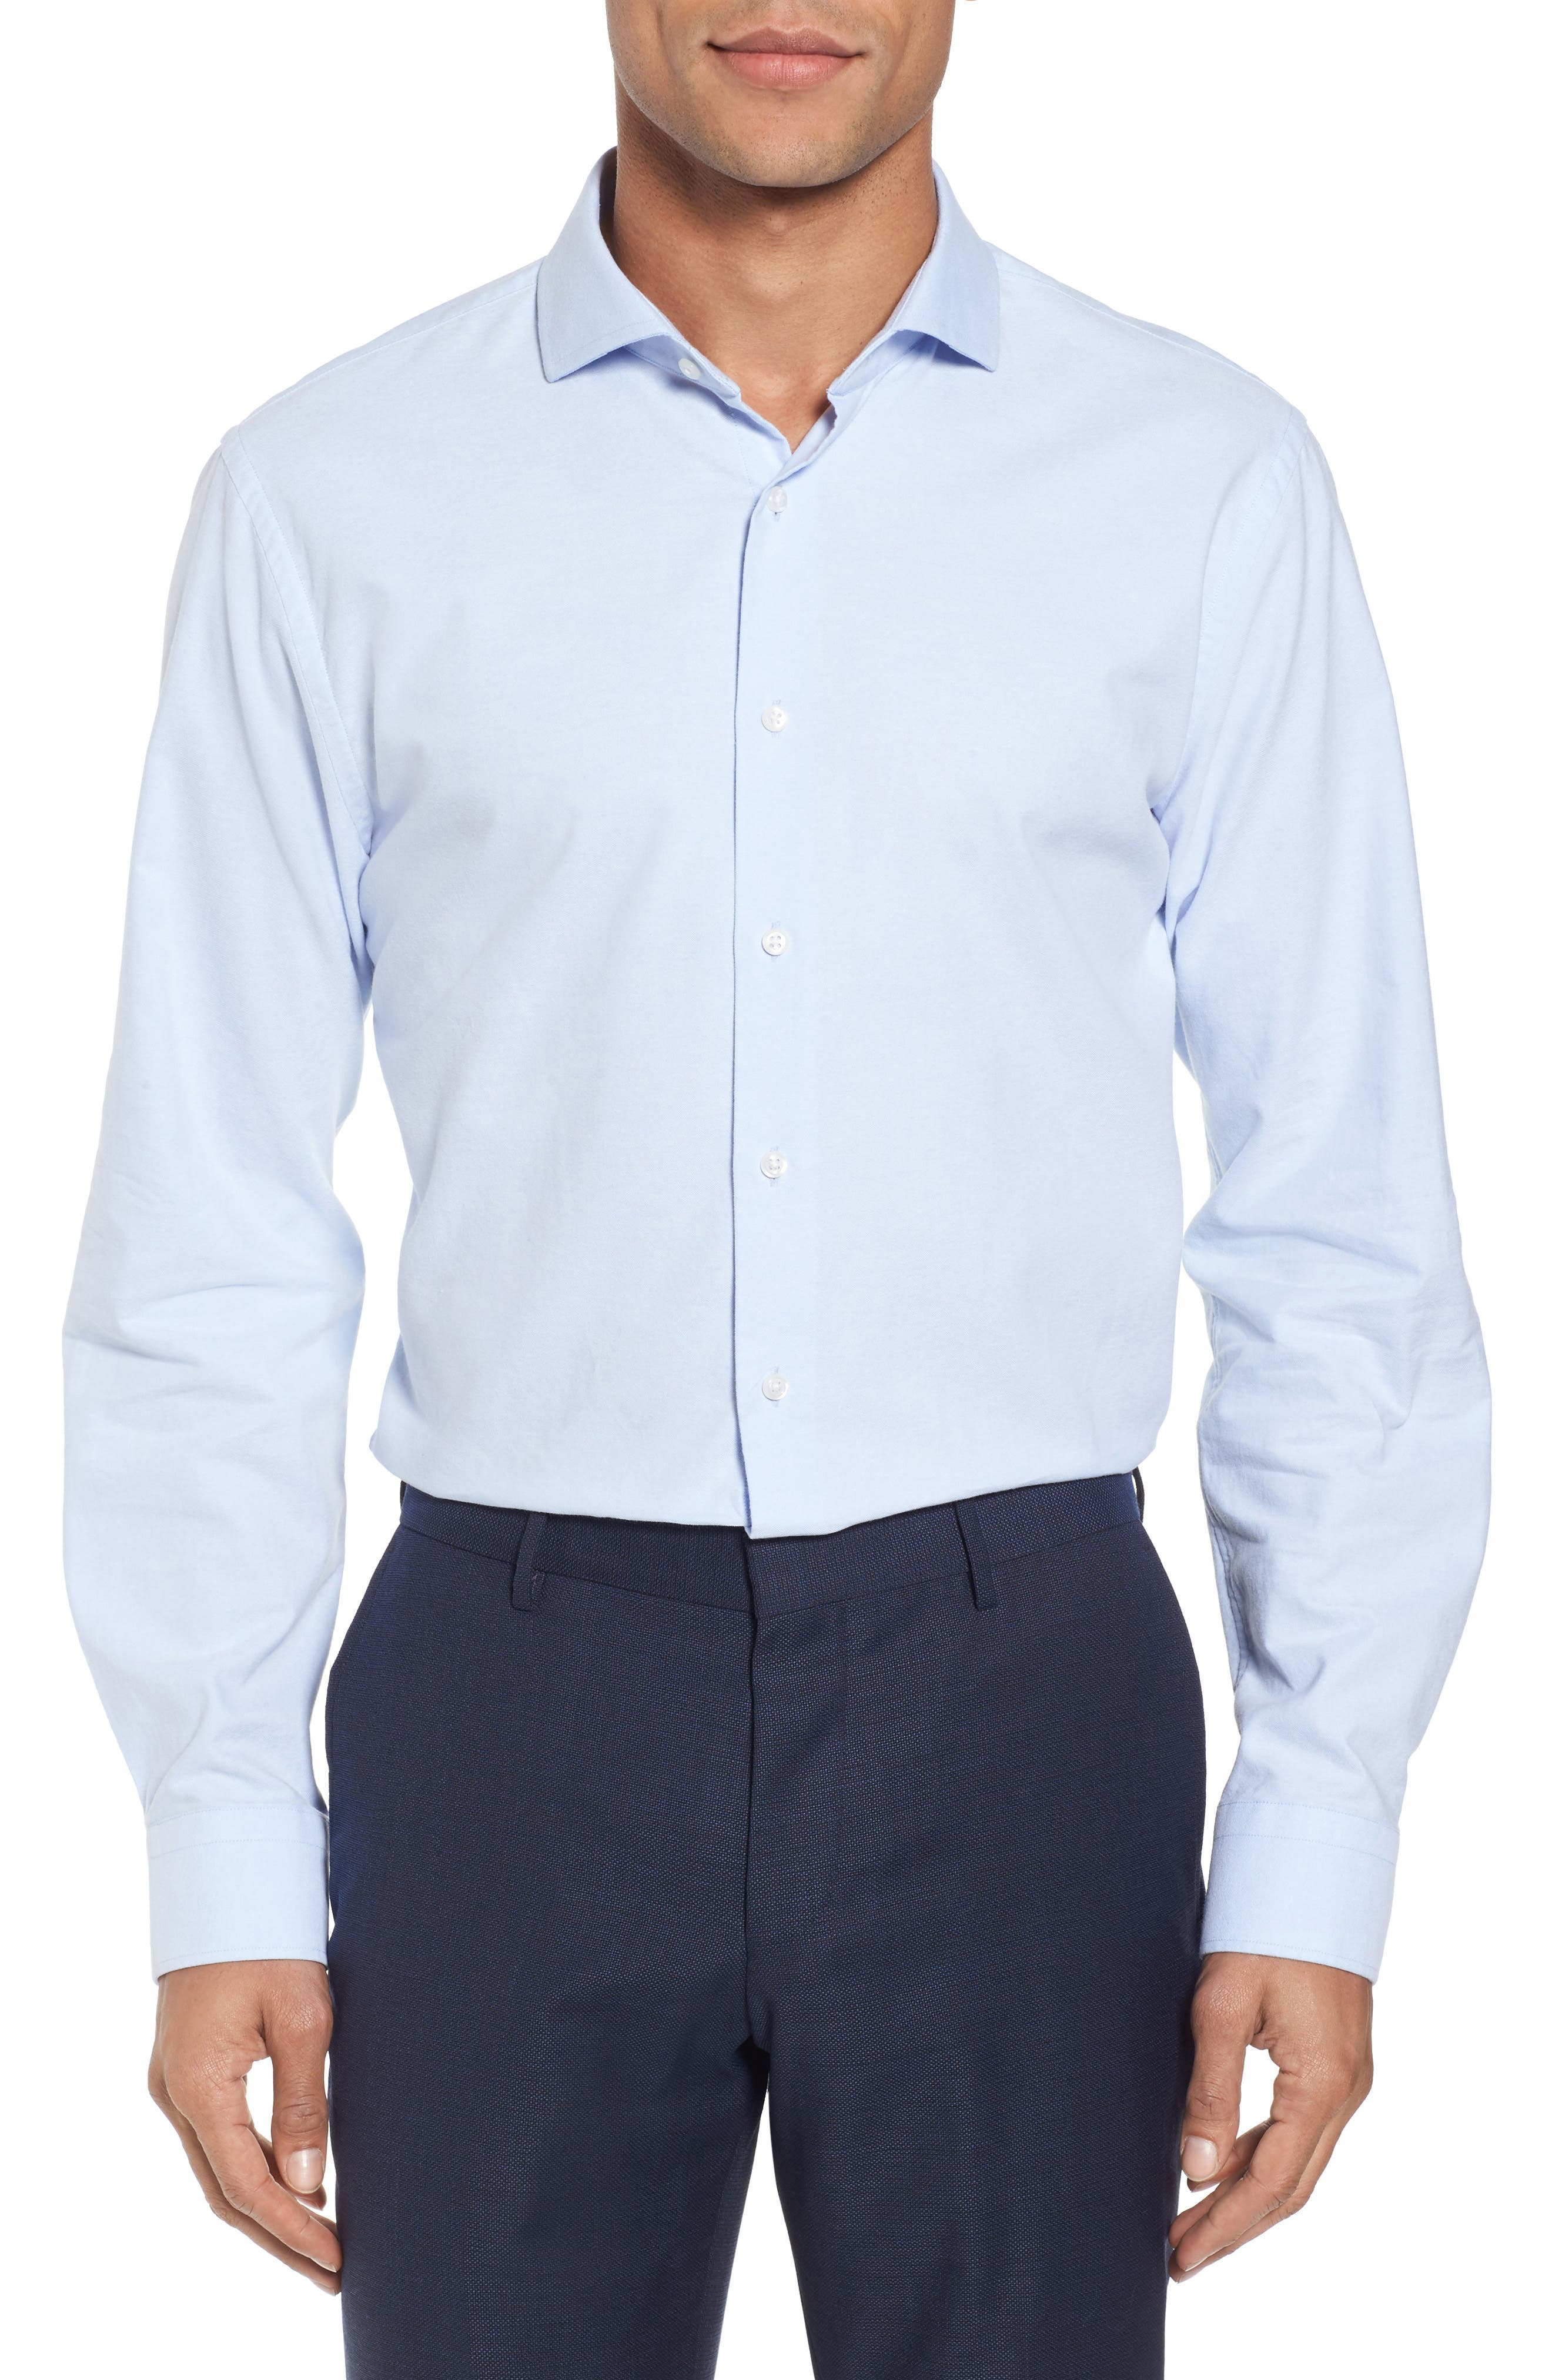 Trim Fit Patterned Dress Shirt,                             Main thumbnail 1, color,